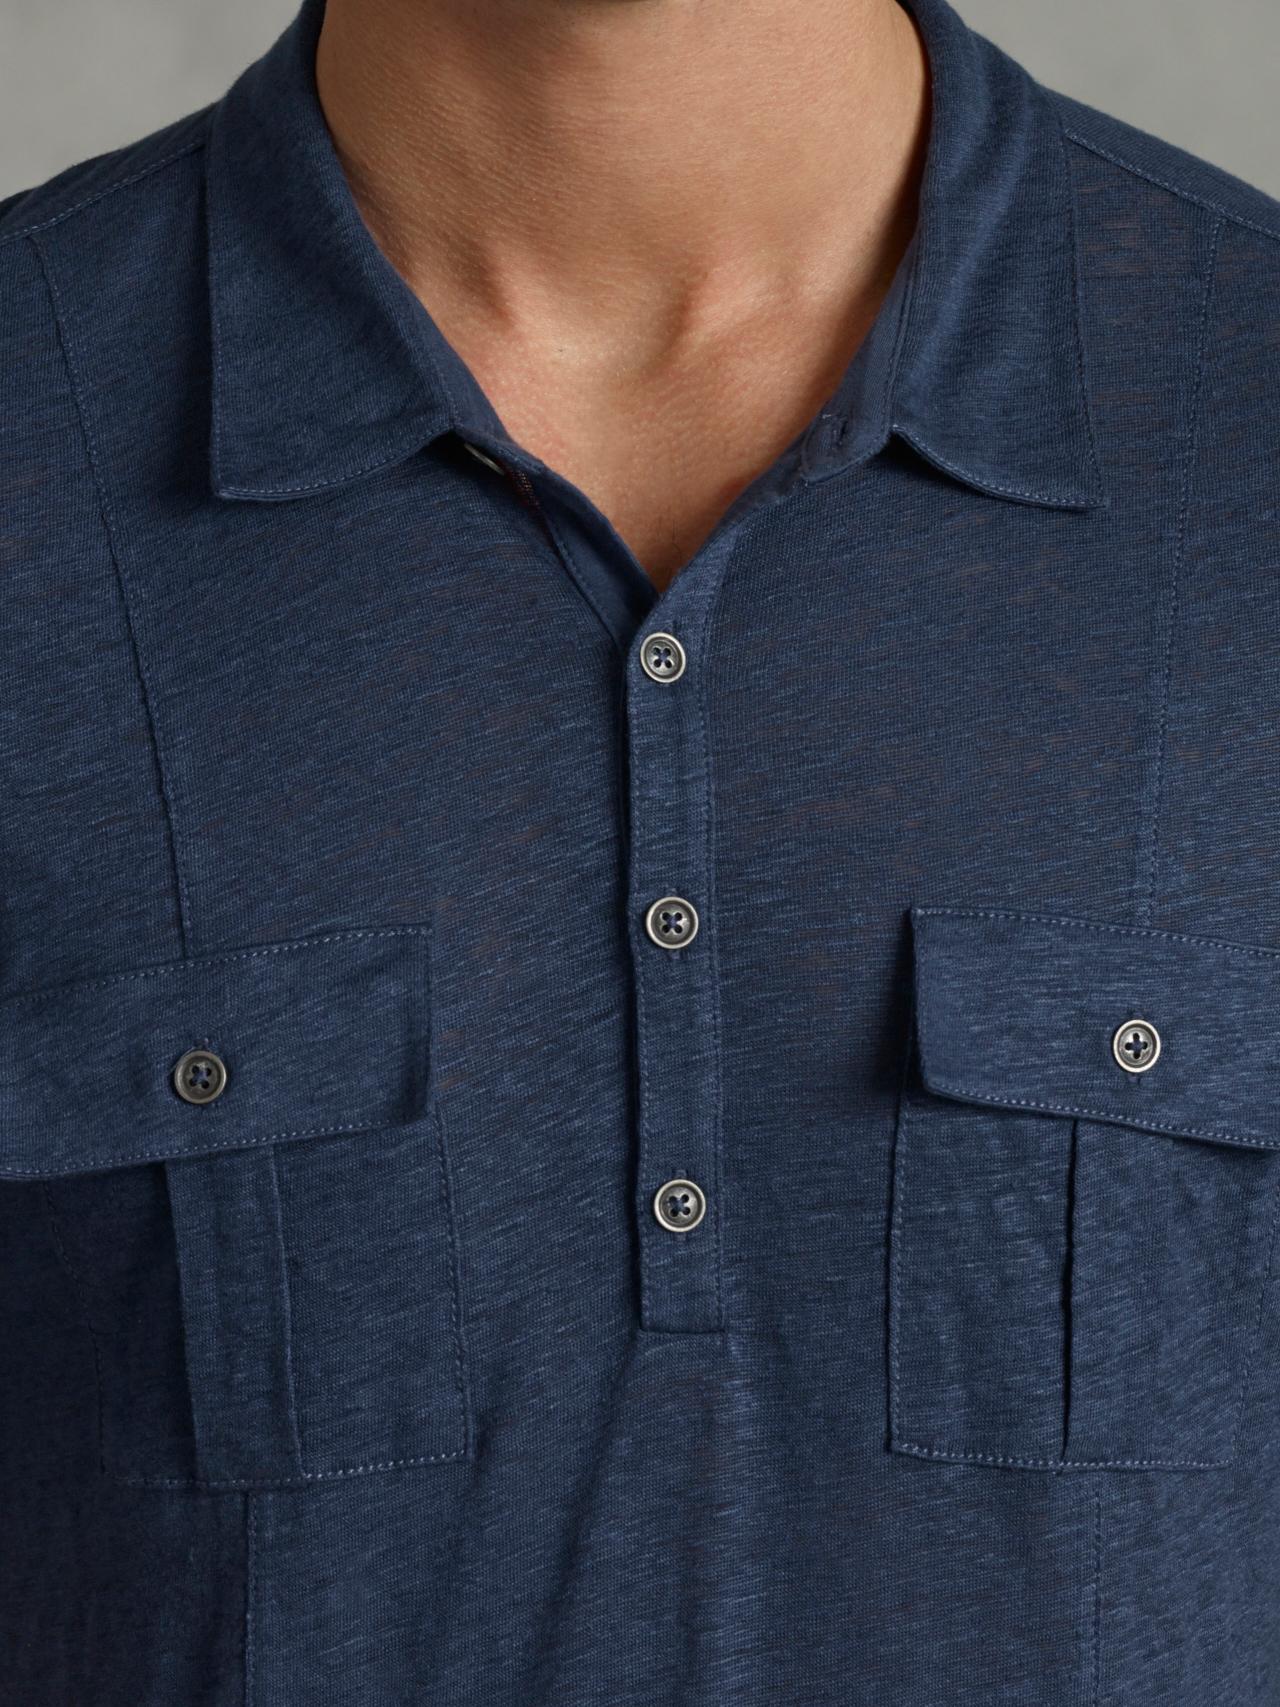 dca16092cdc1 Mens Double Pocket Polo Shirts - BCD Tofu House